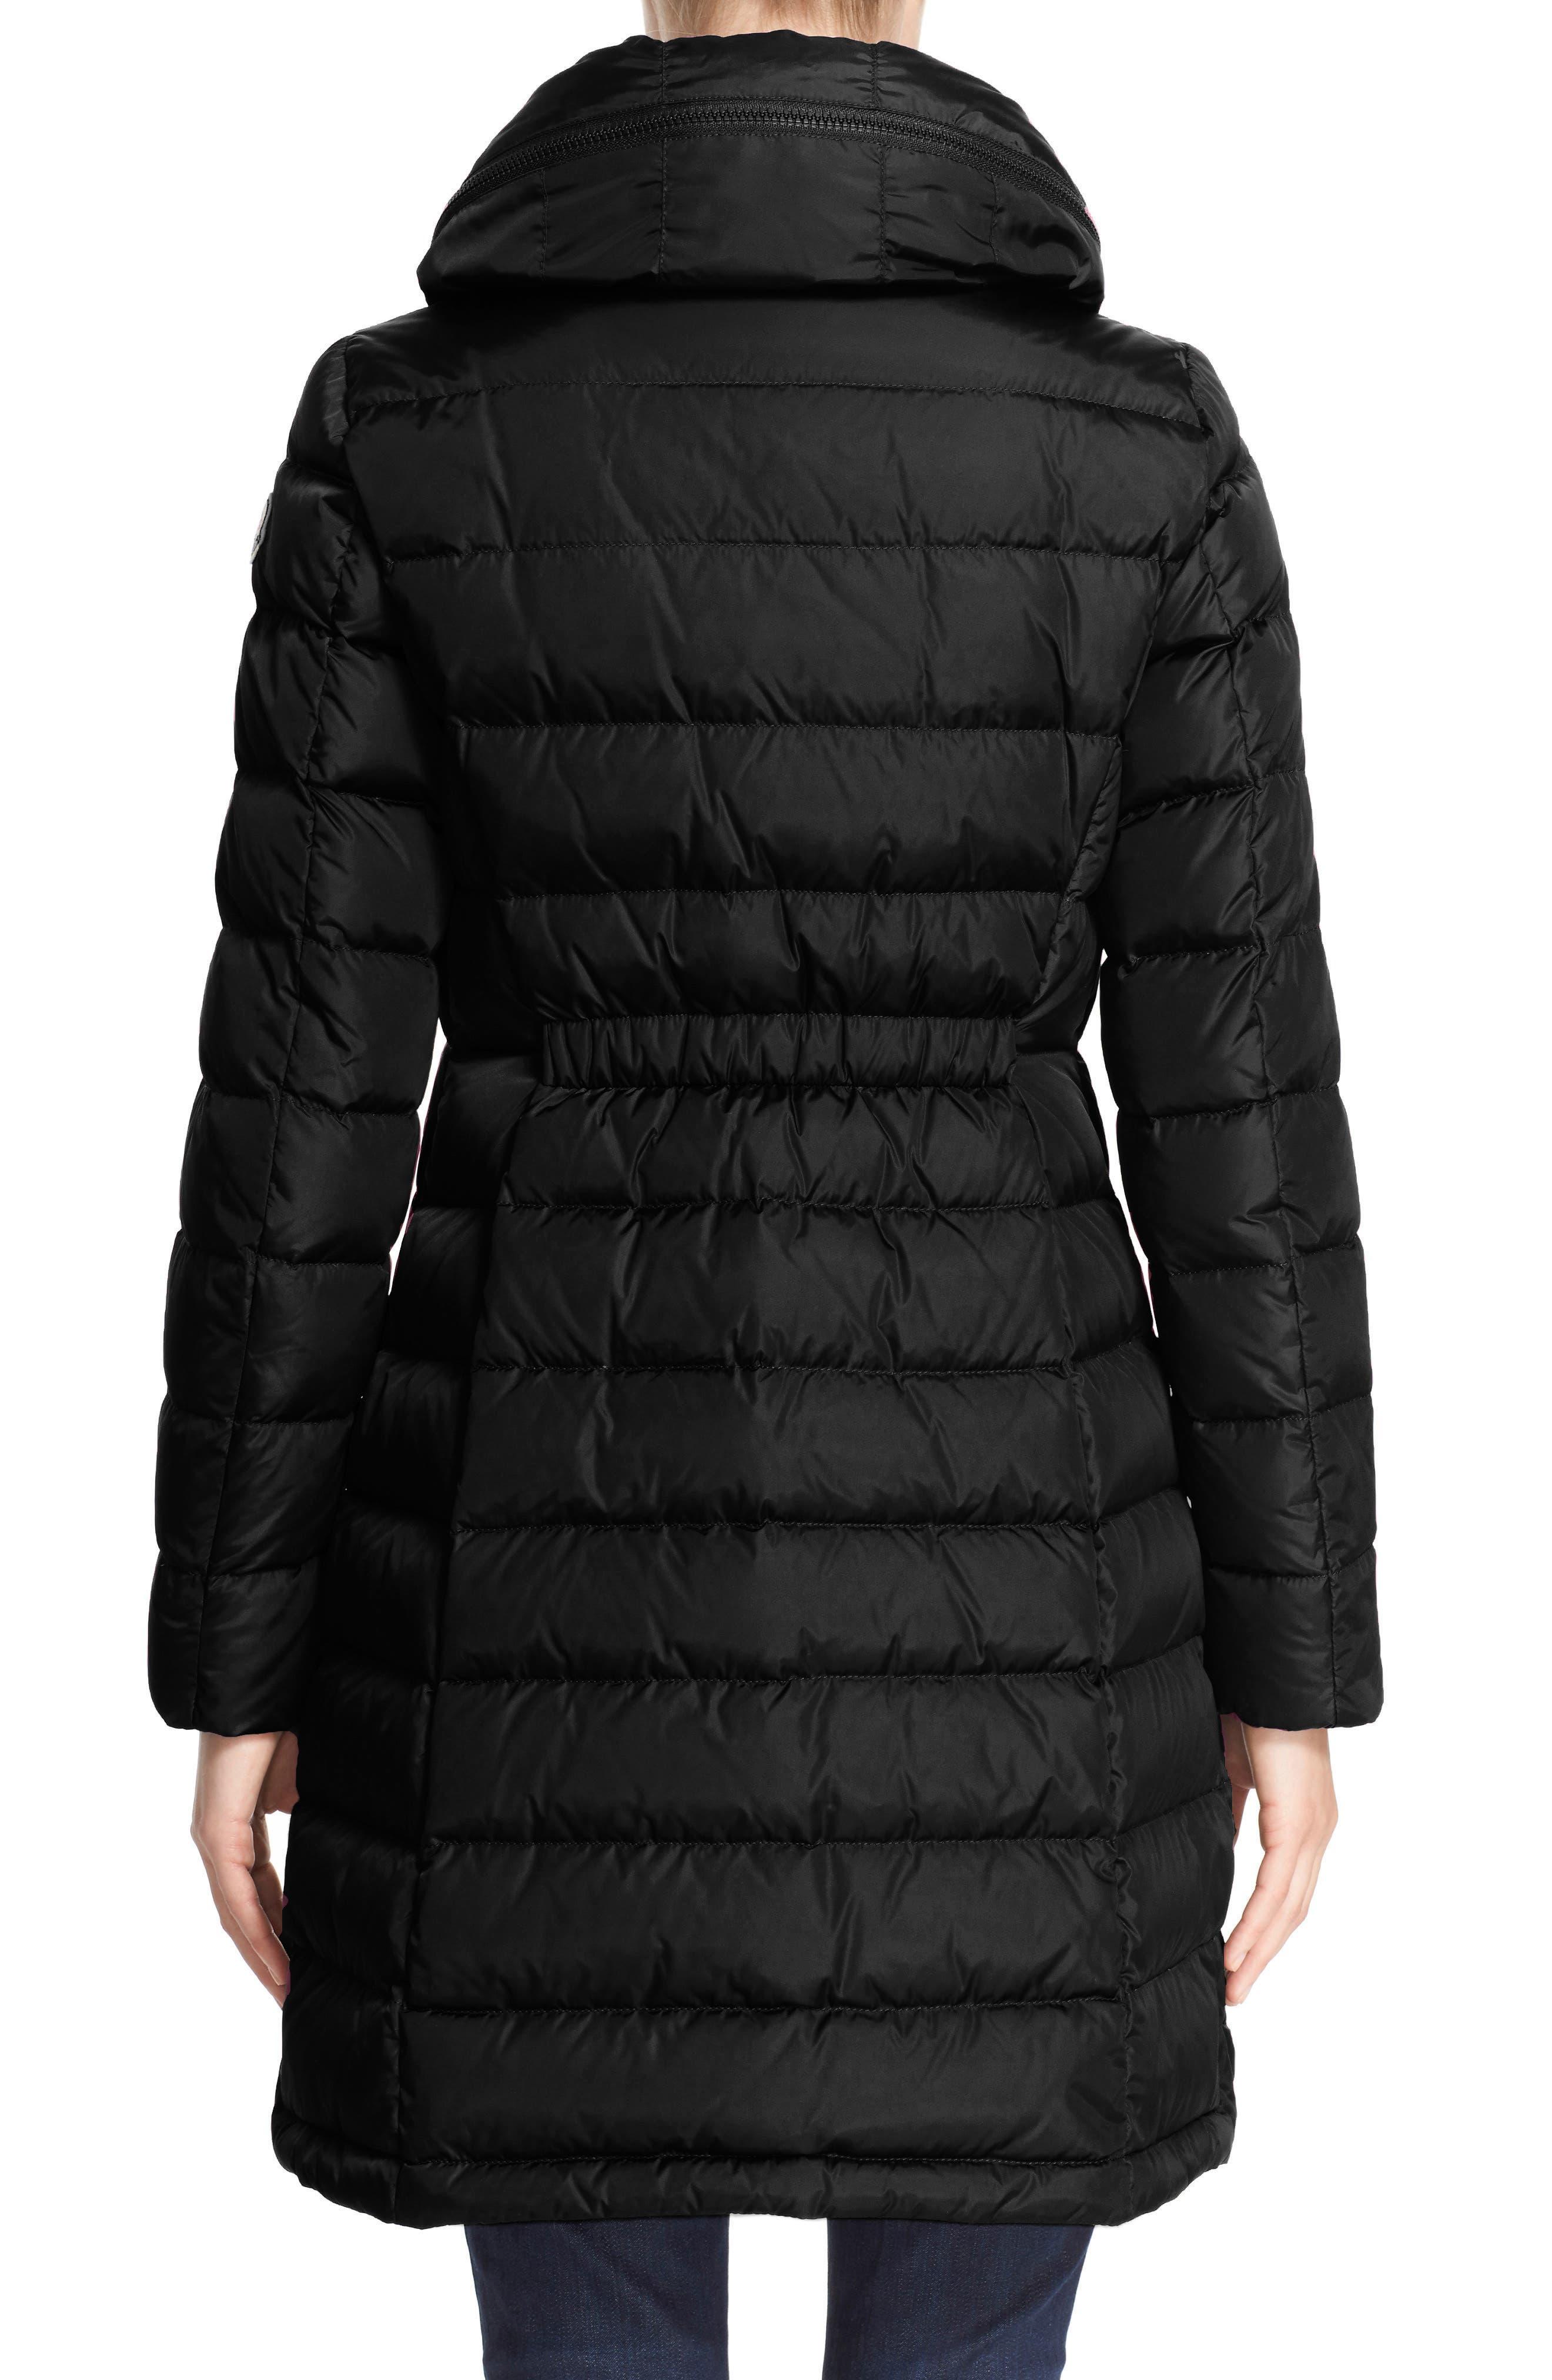 MONCLER,                             'Flammette' Water Resistant Long Hooded Down Coat,                             Alternate thumbnail 2, color,                             BLACK